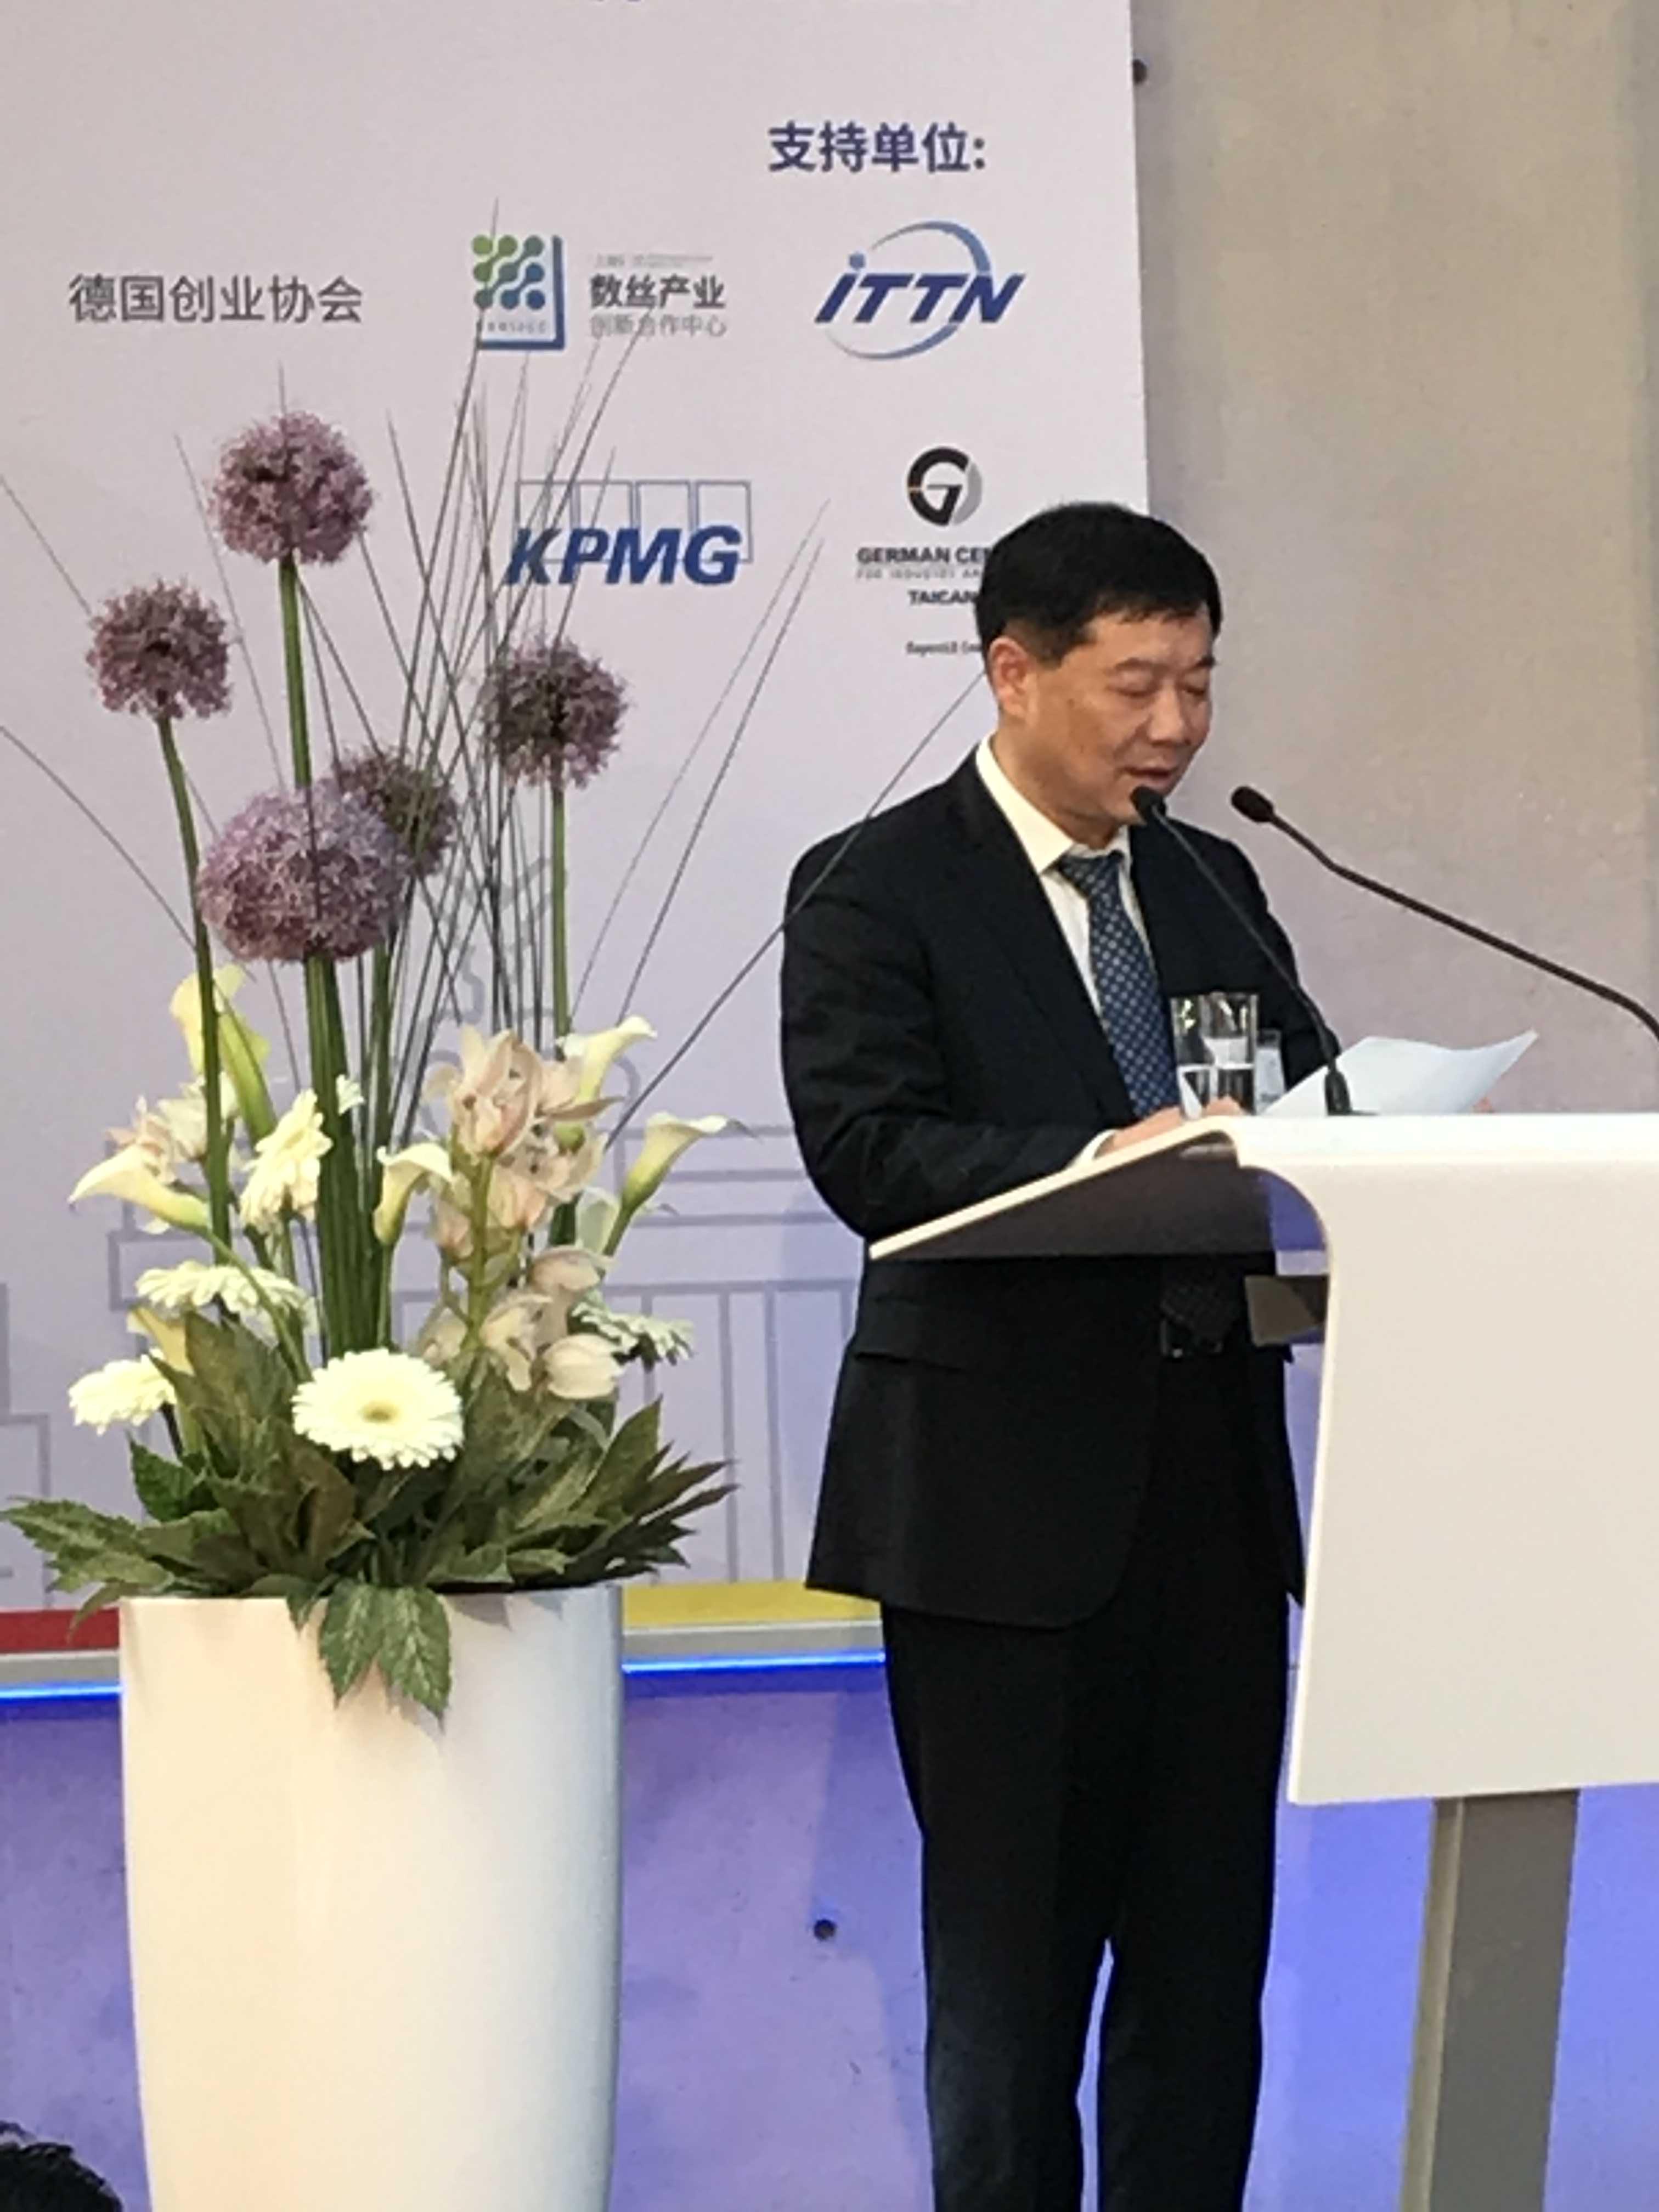 Parteisekretär WANG Hongxing erläutert die Standortvorteile Taicangs